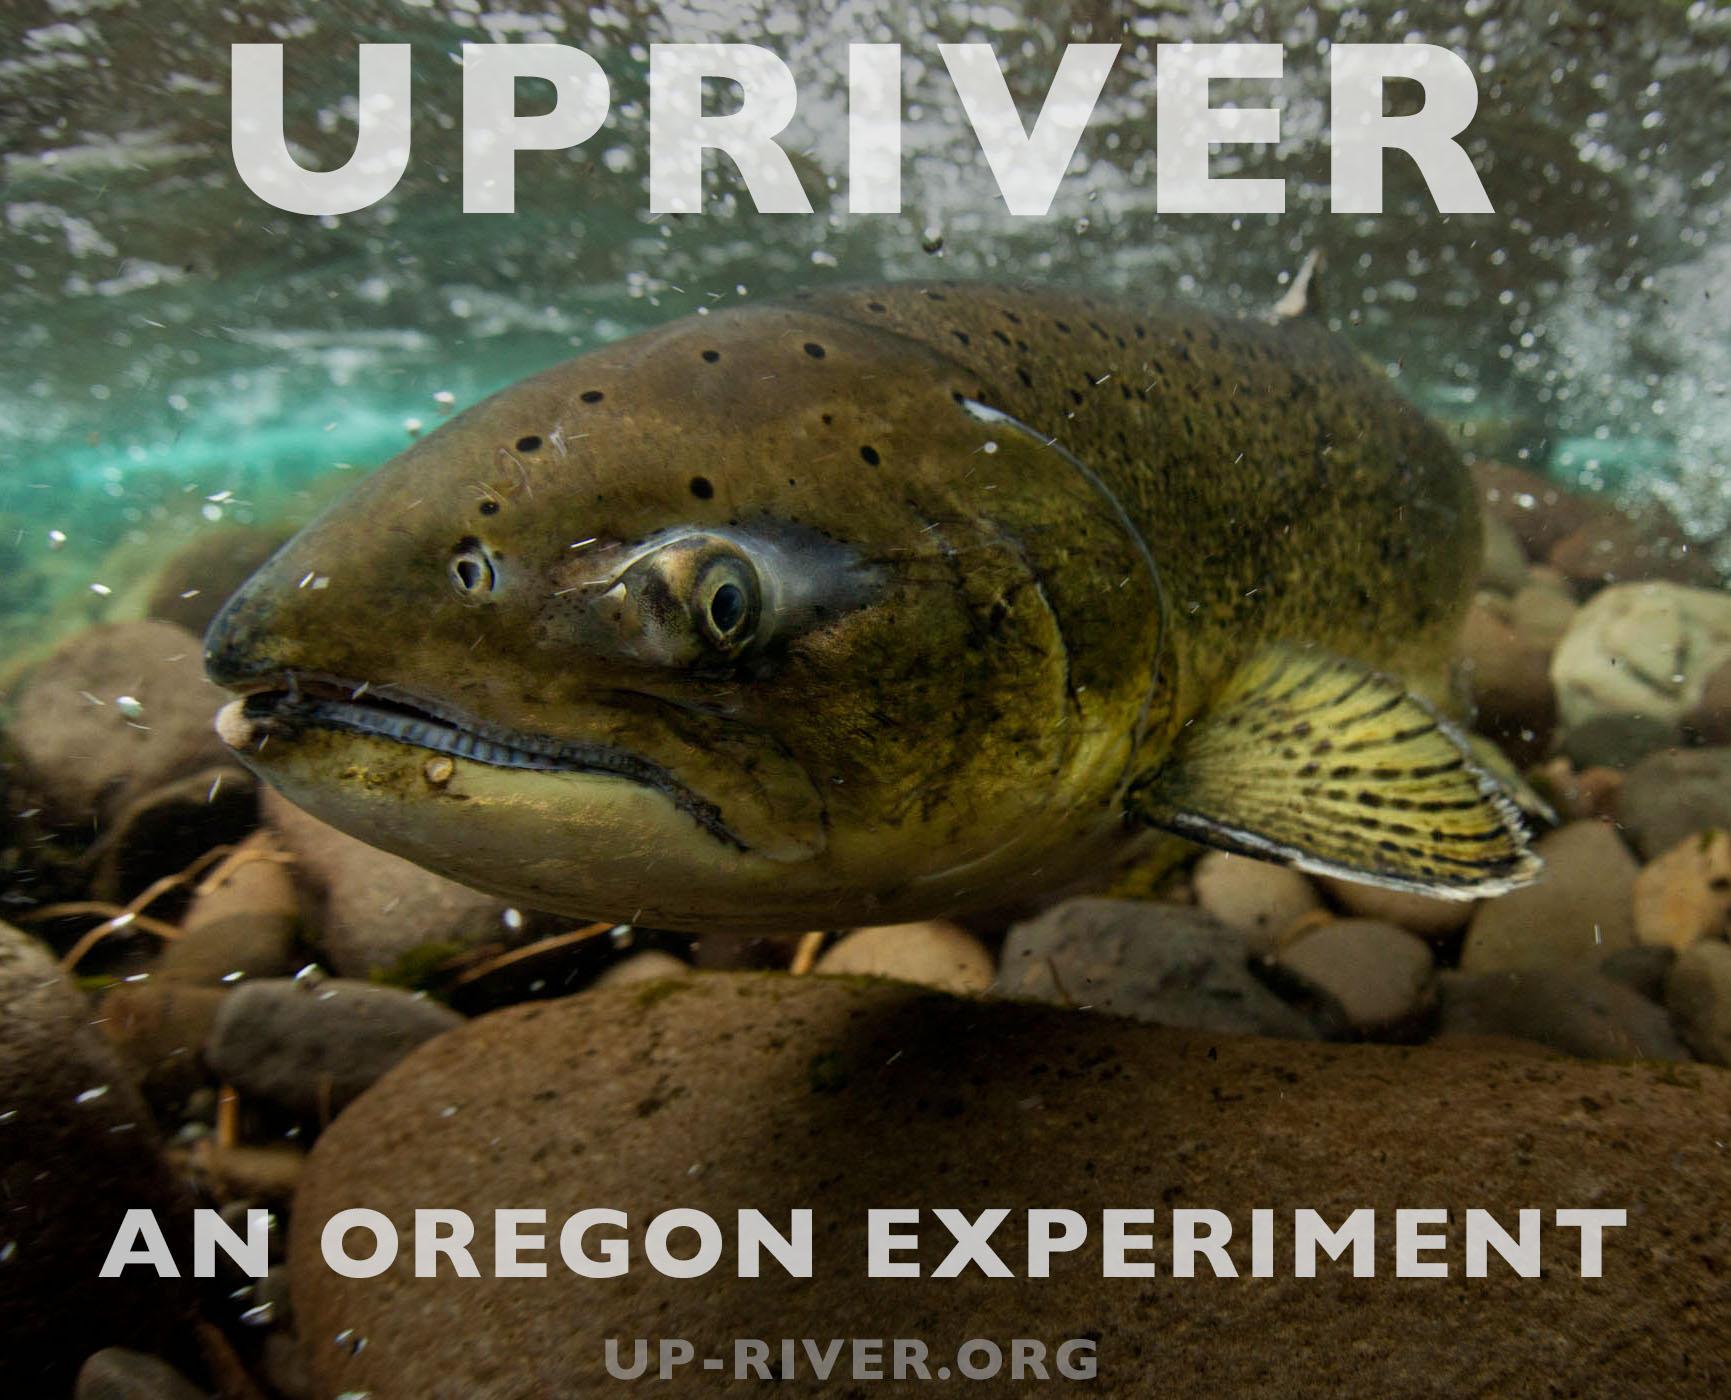 Upriver: An Oregon Experiment